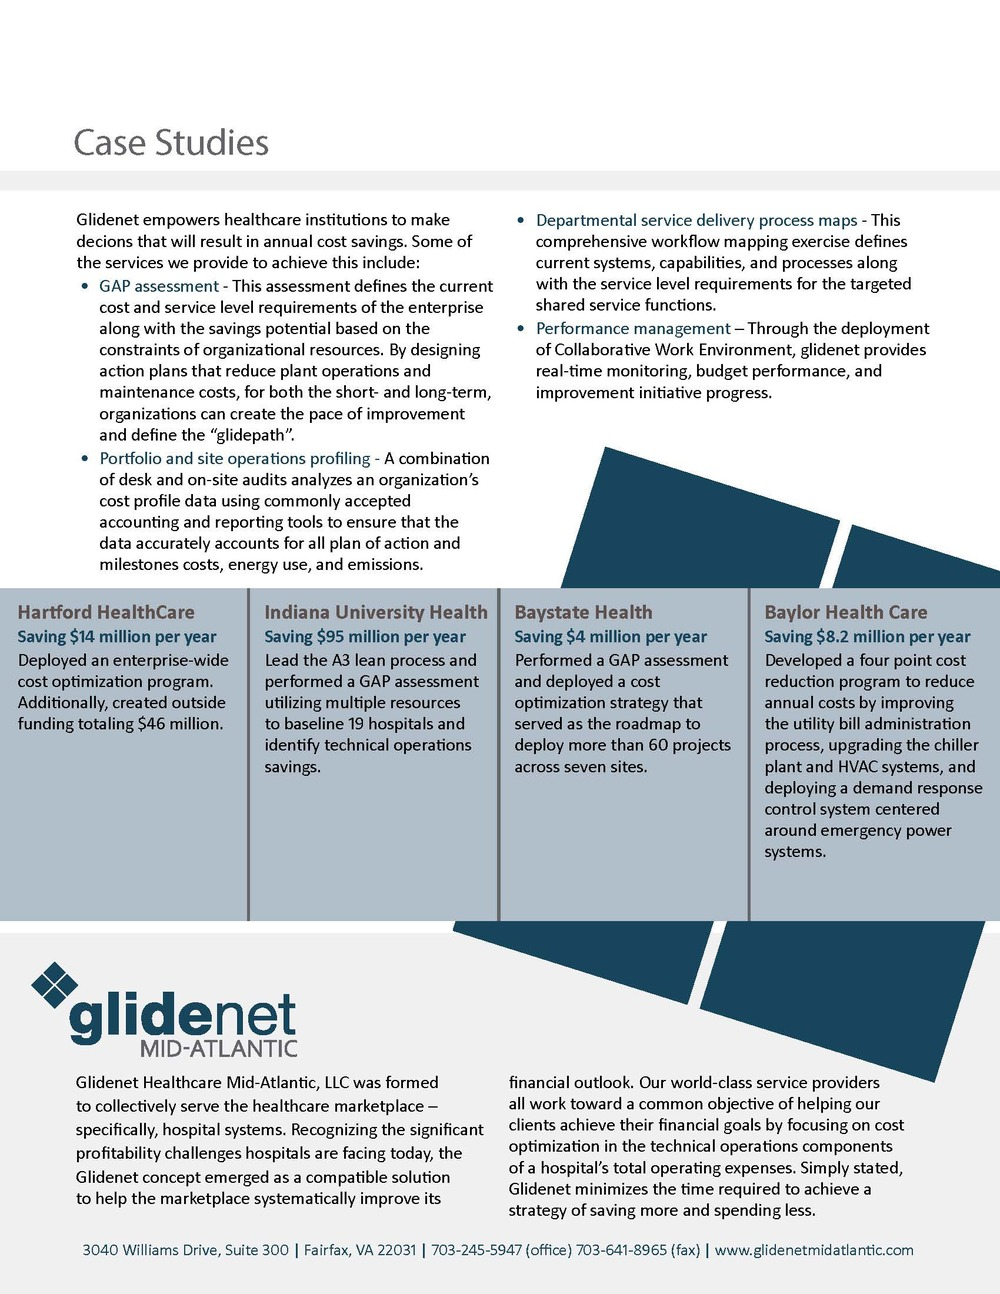 Glidenet Case Studies_Page_1.jpg